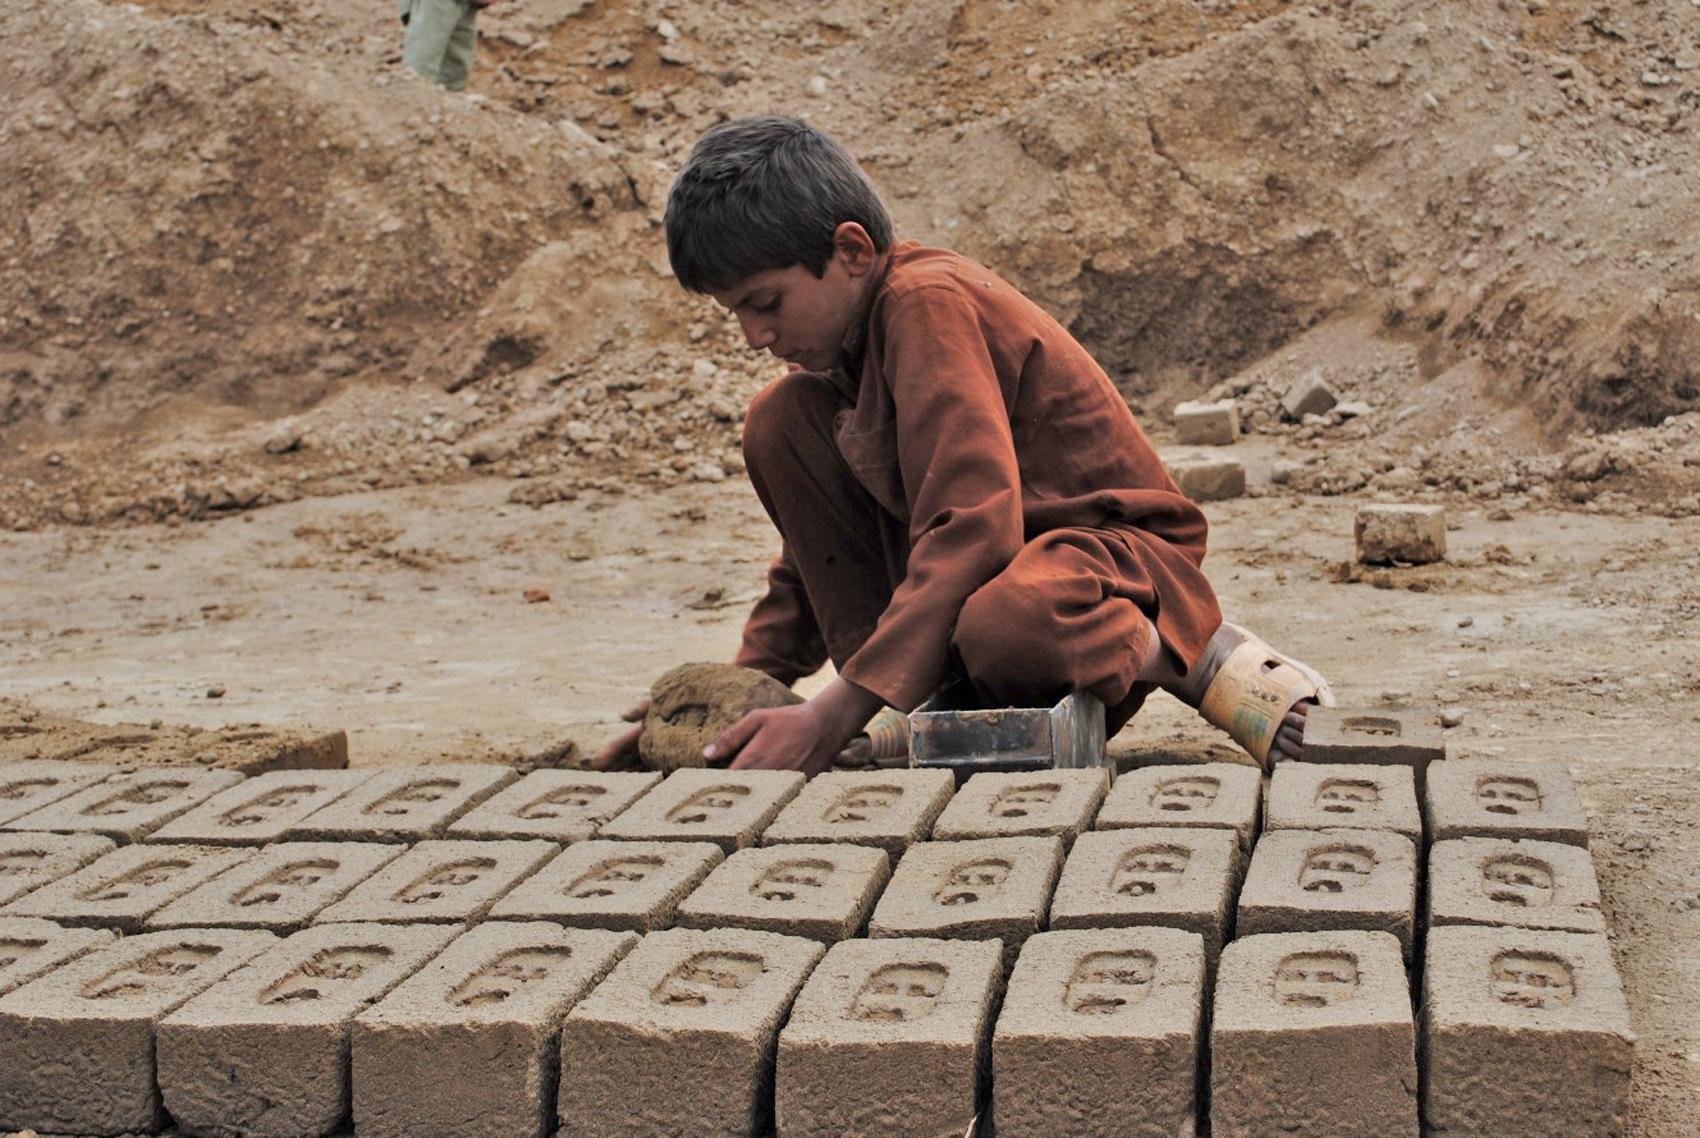 A boy makes bricks at a kiln in Afghanistan